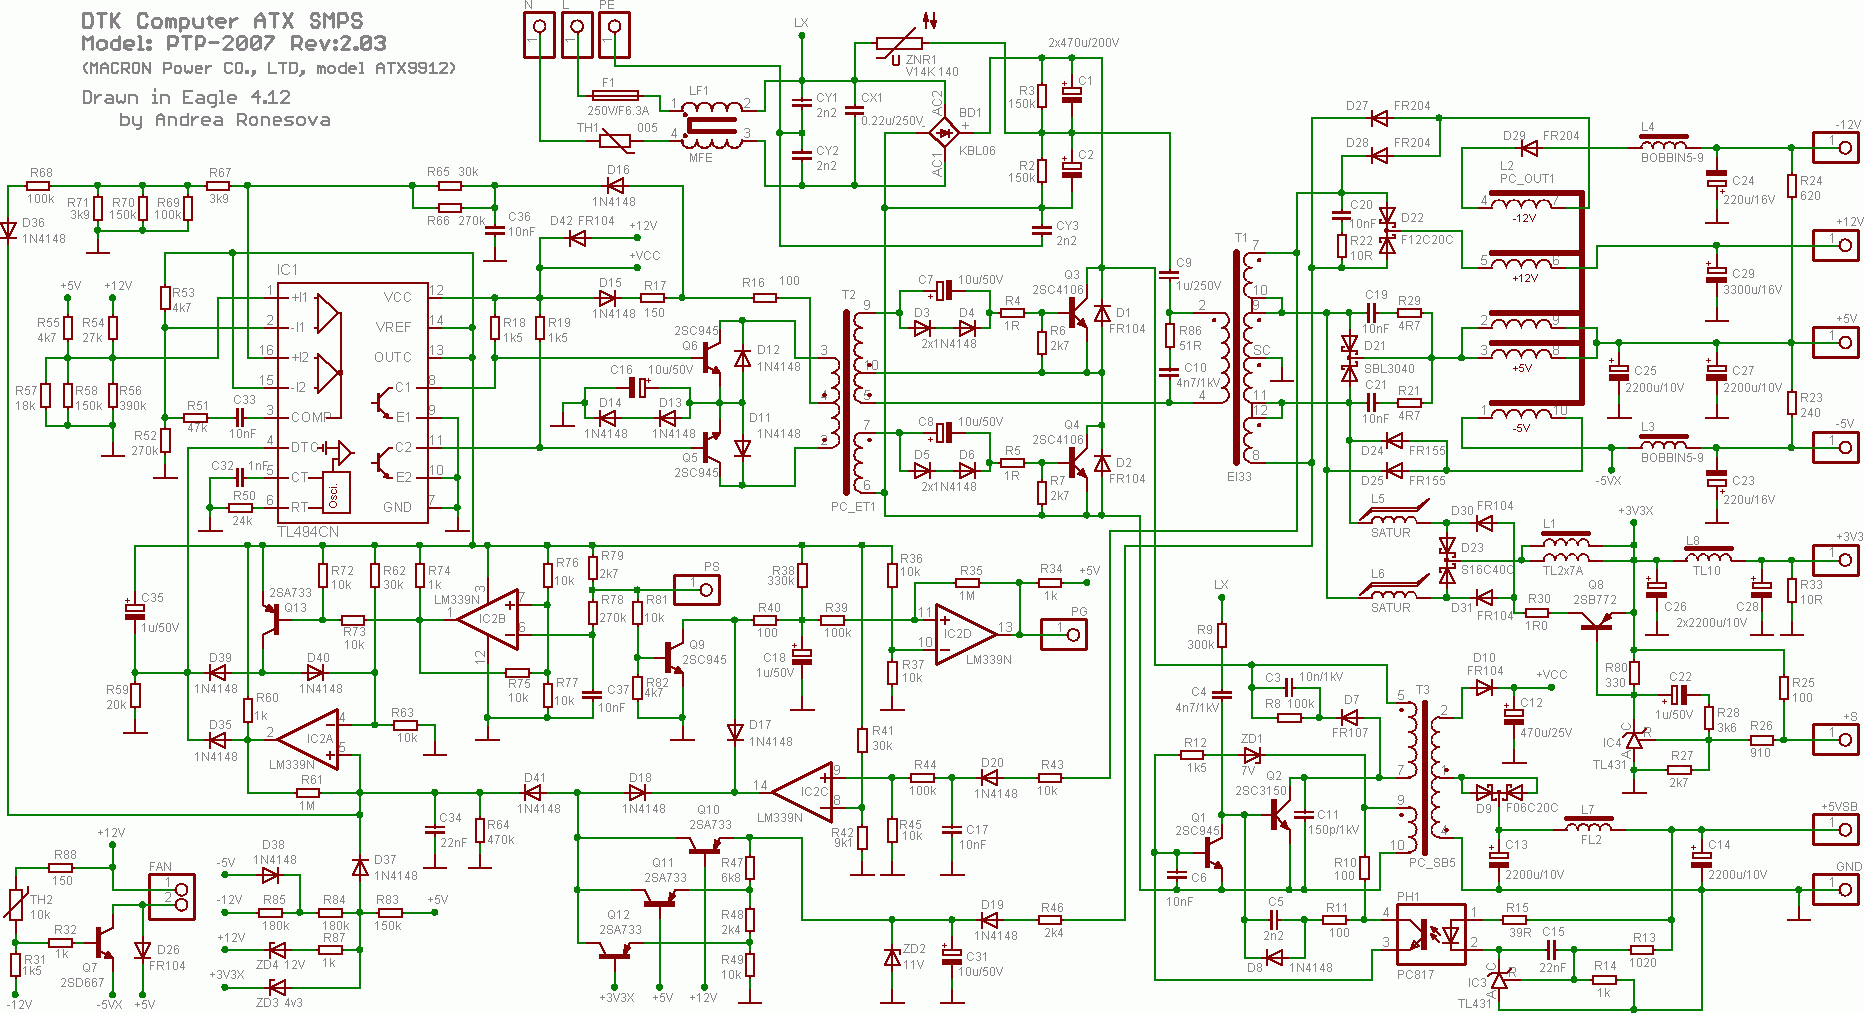 Atx Power Wiring Diagram | Wiring Diagram - Bestec Atx-250-12Z Wiring Diagram